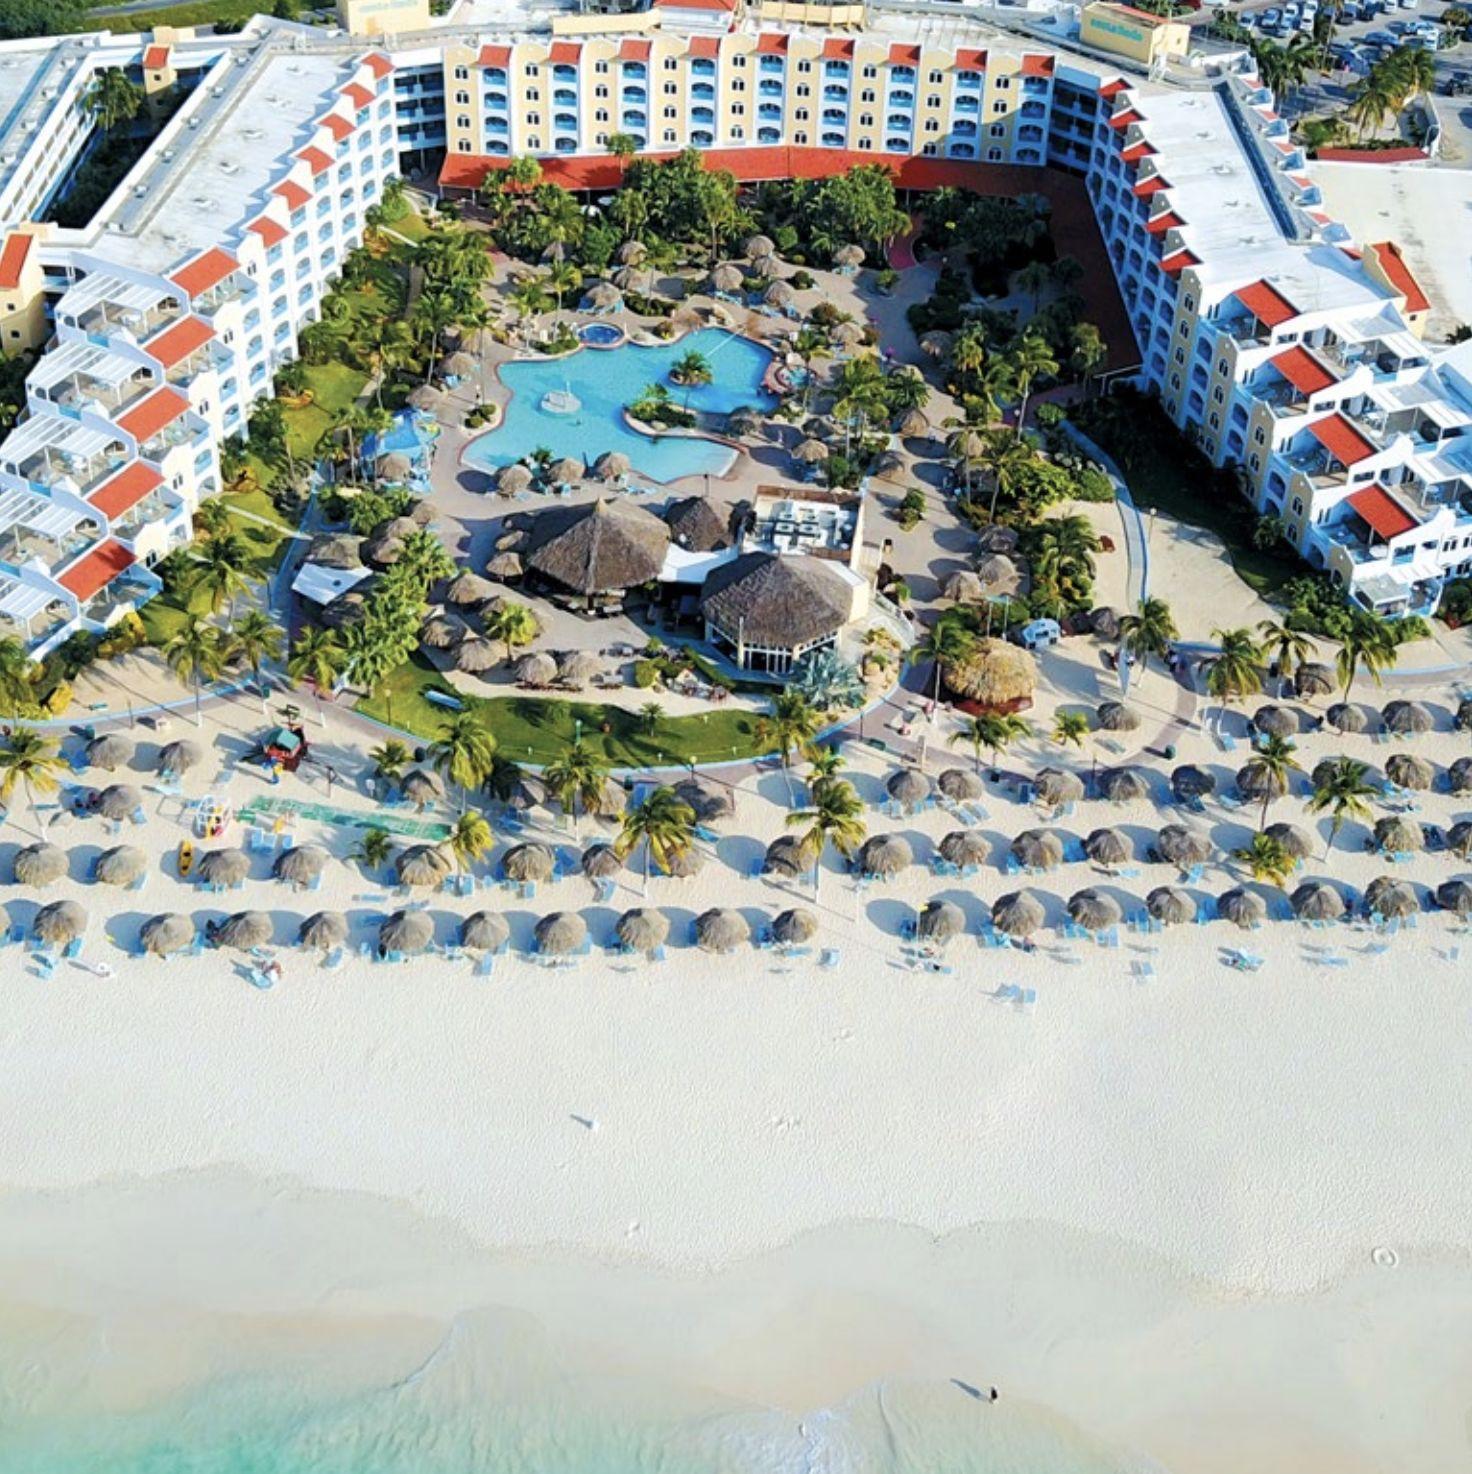 Costa linda beach resort mnycyn